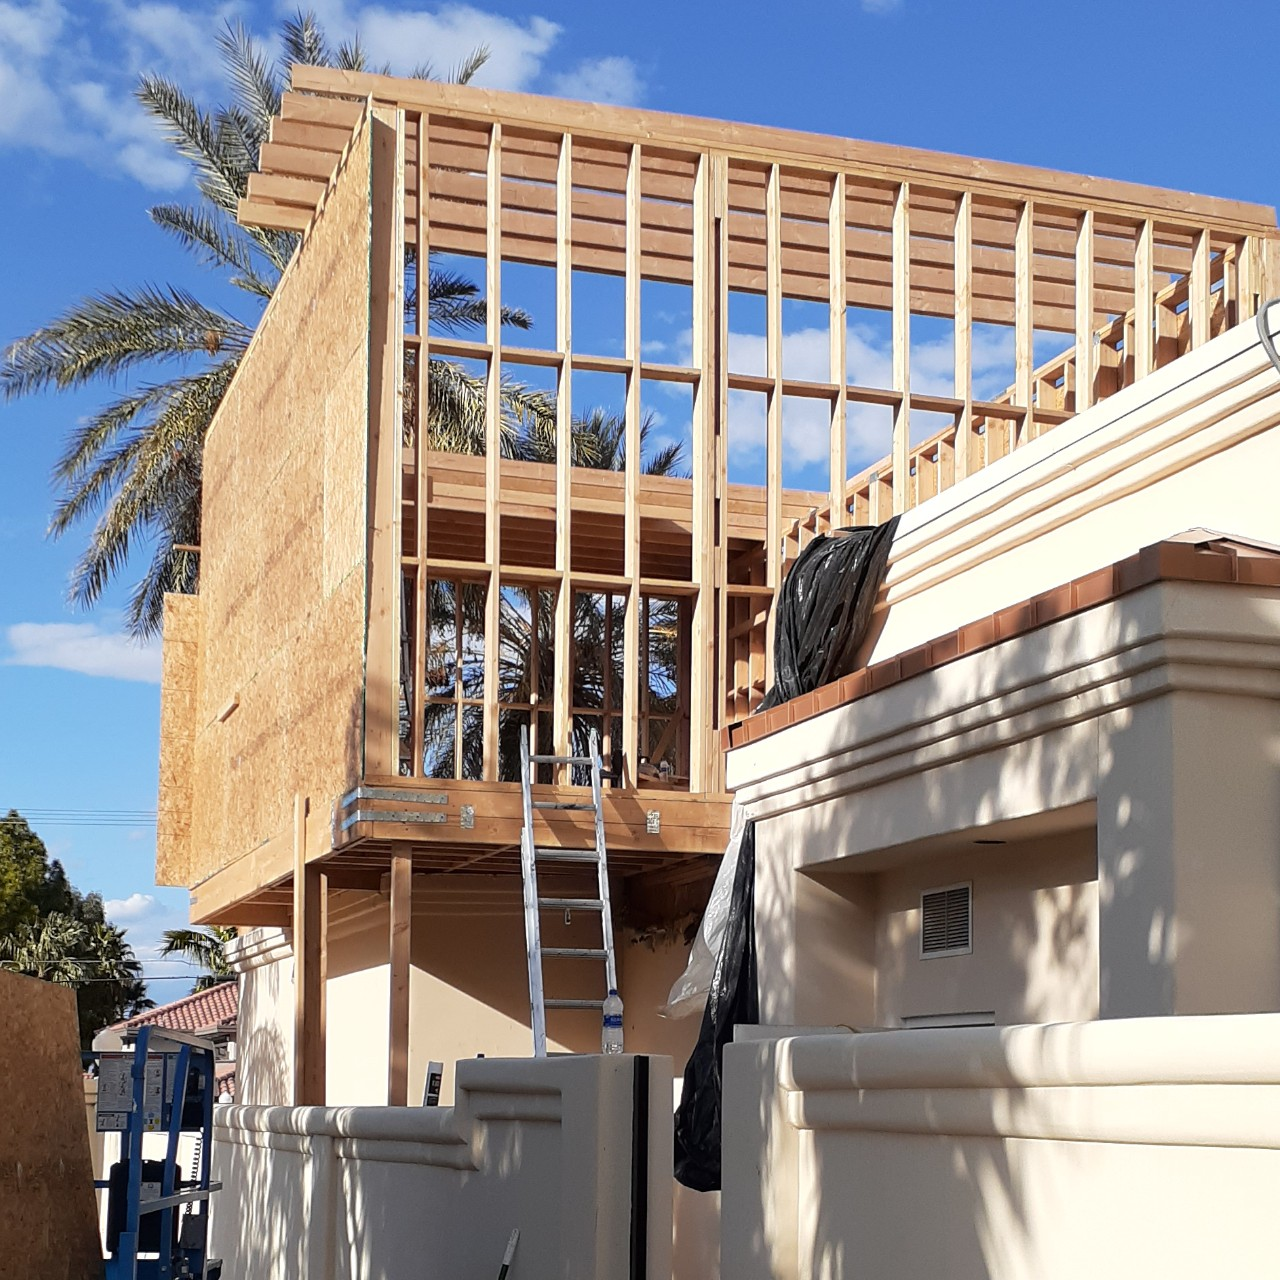 carpentry-wood-framing-second-floor-home-addition--framing-108